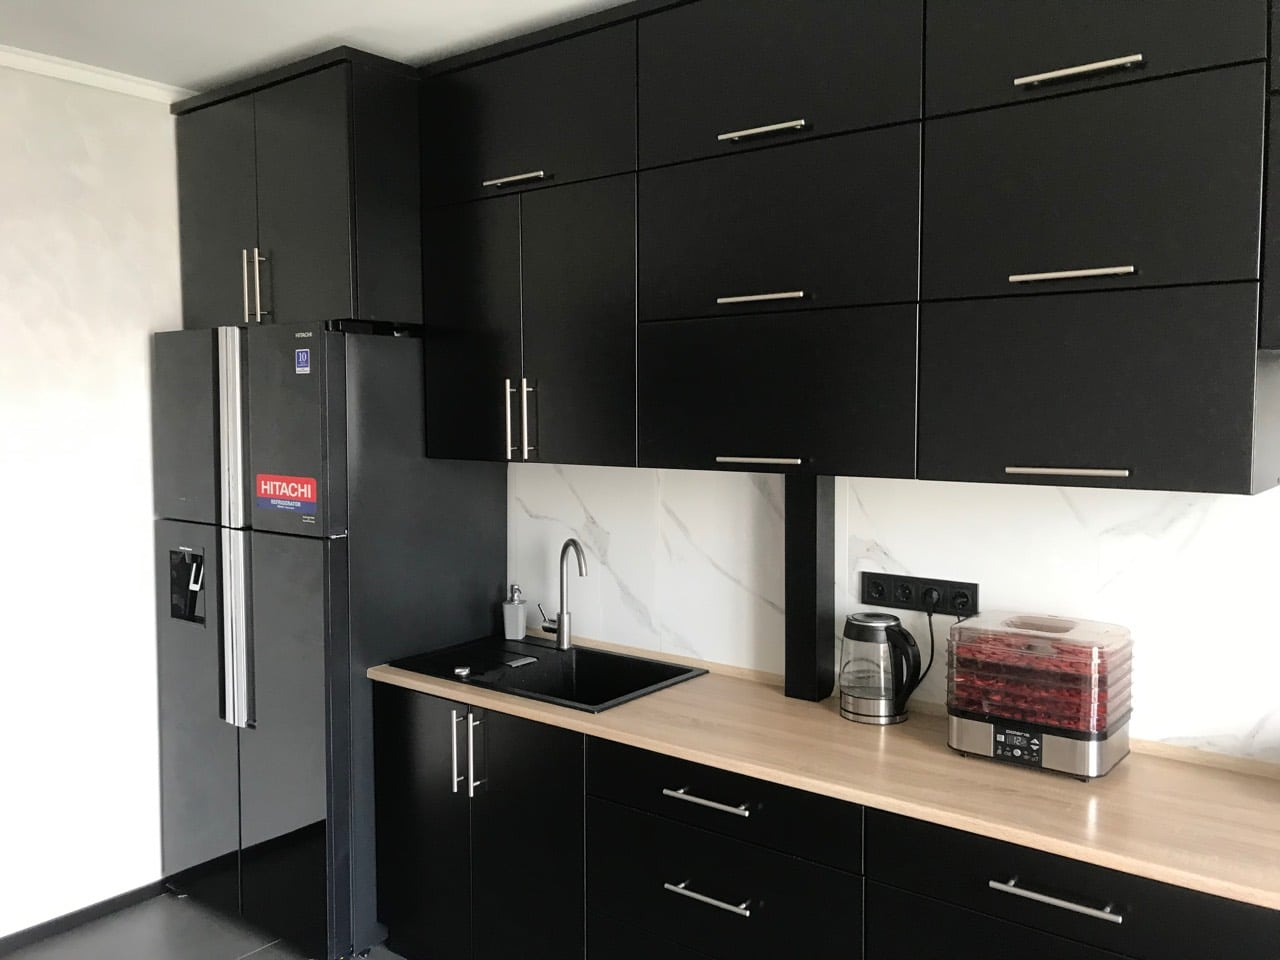 R-W660puc7GBK_int99 Холодильник для кухни-студии, дизайн.